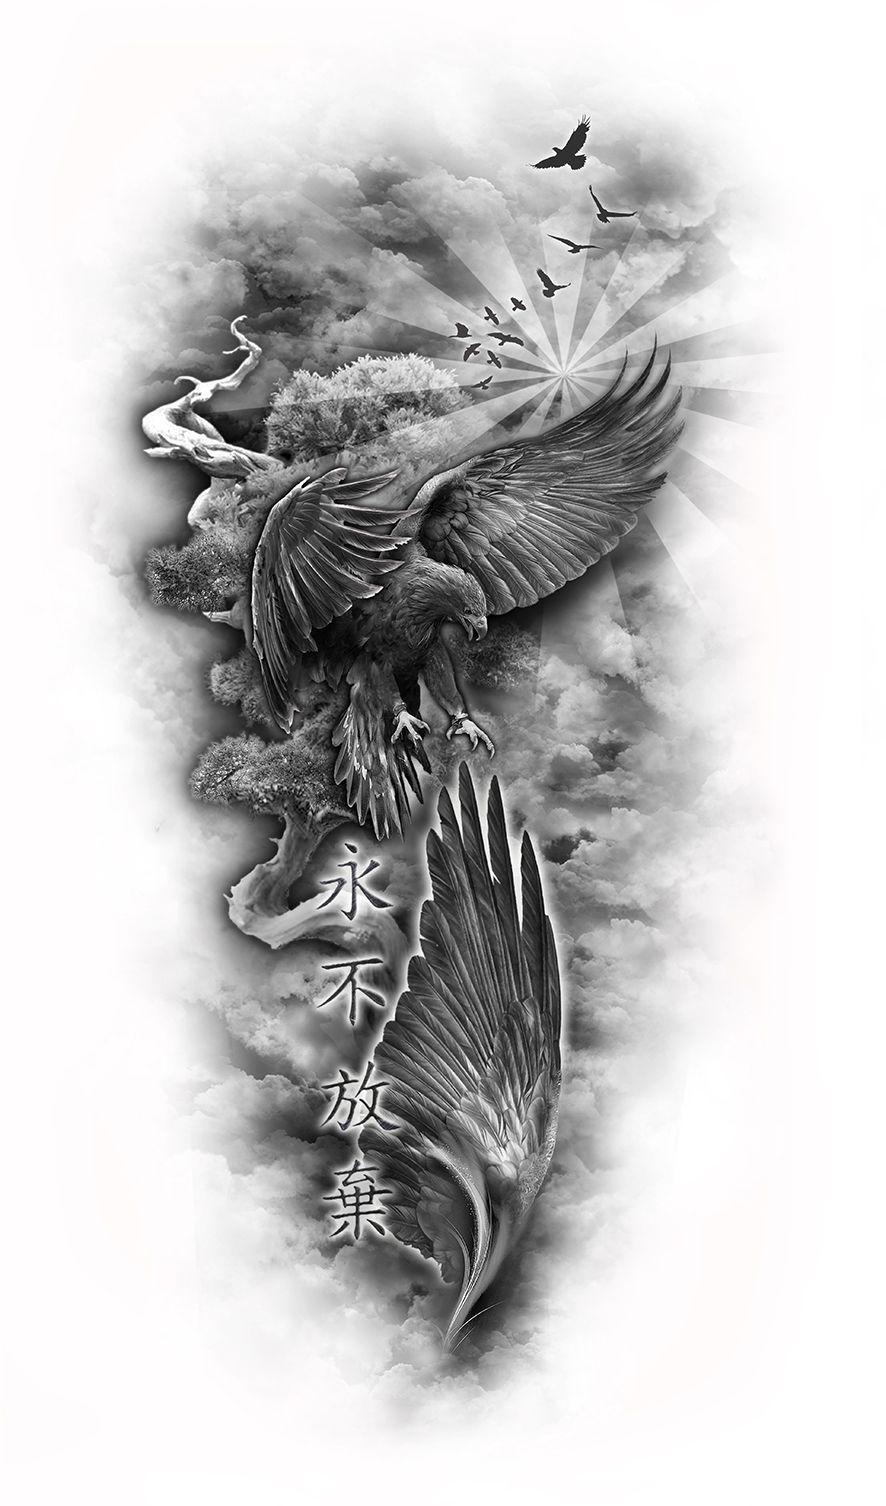 Columbus Custom Tattoo Designs: Www.customtattoodesign.net Wp-content Uploads 2014 04